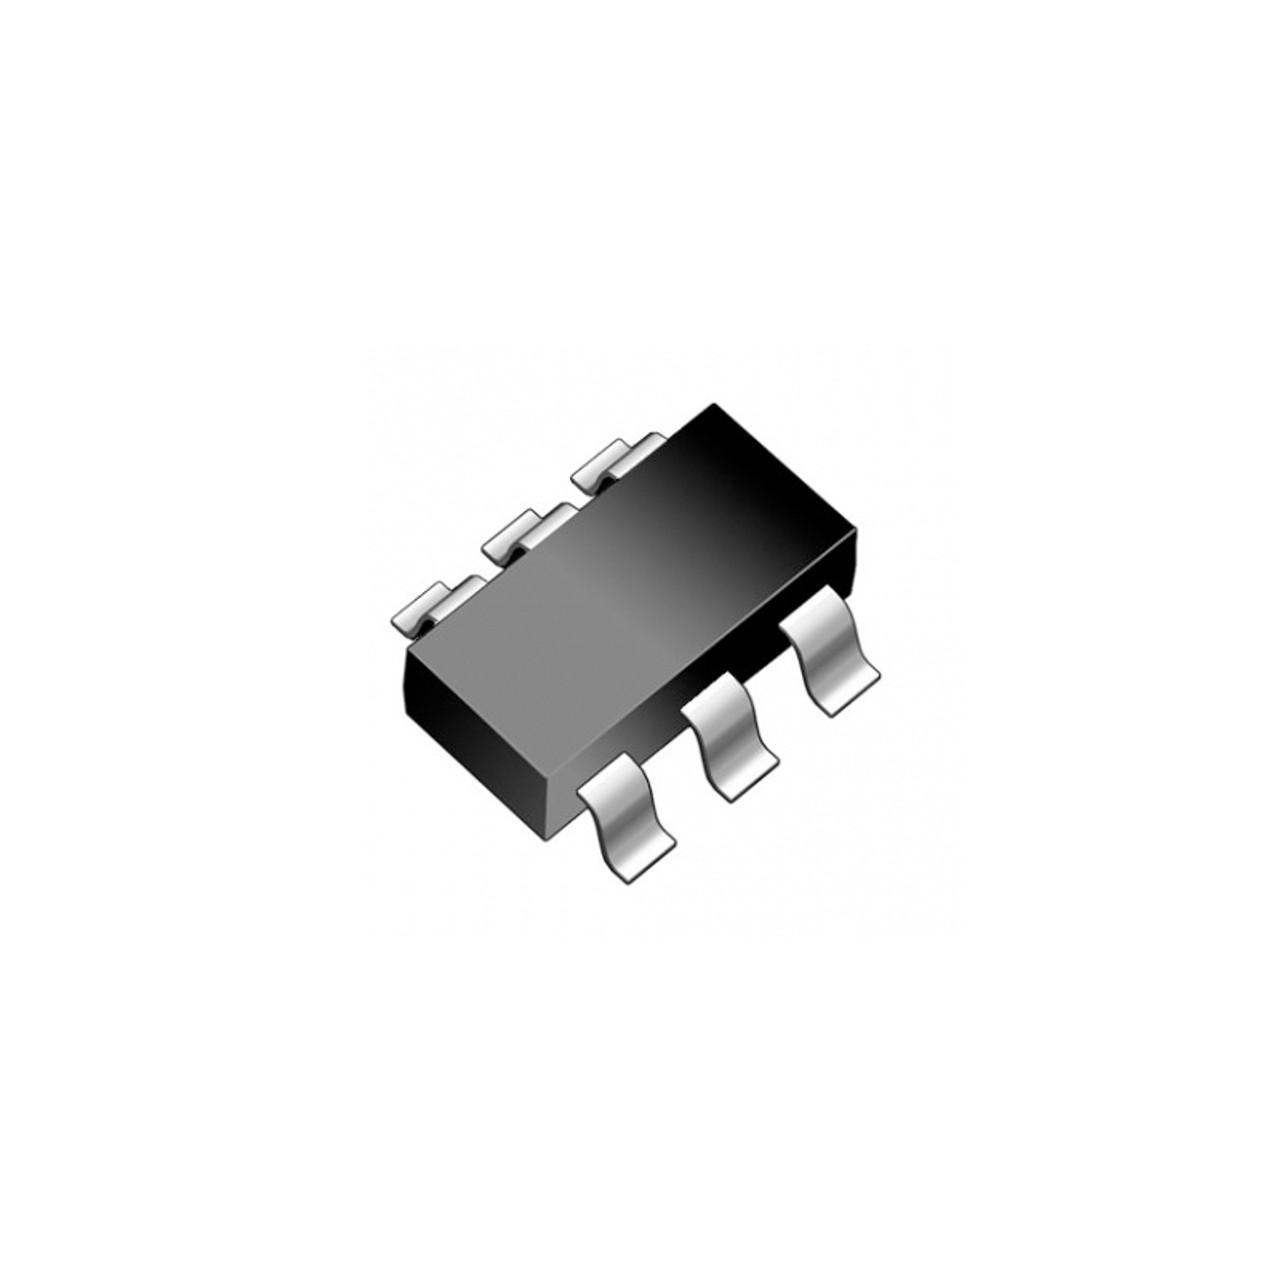 TP4057 - Top Power | Battery Management IC | Evelta